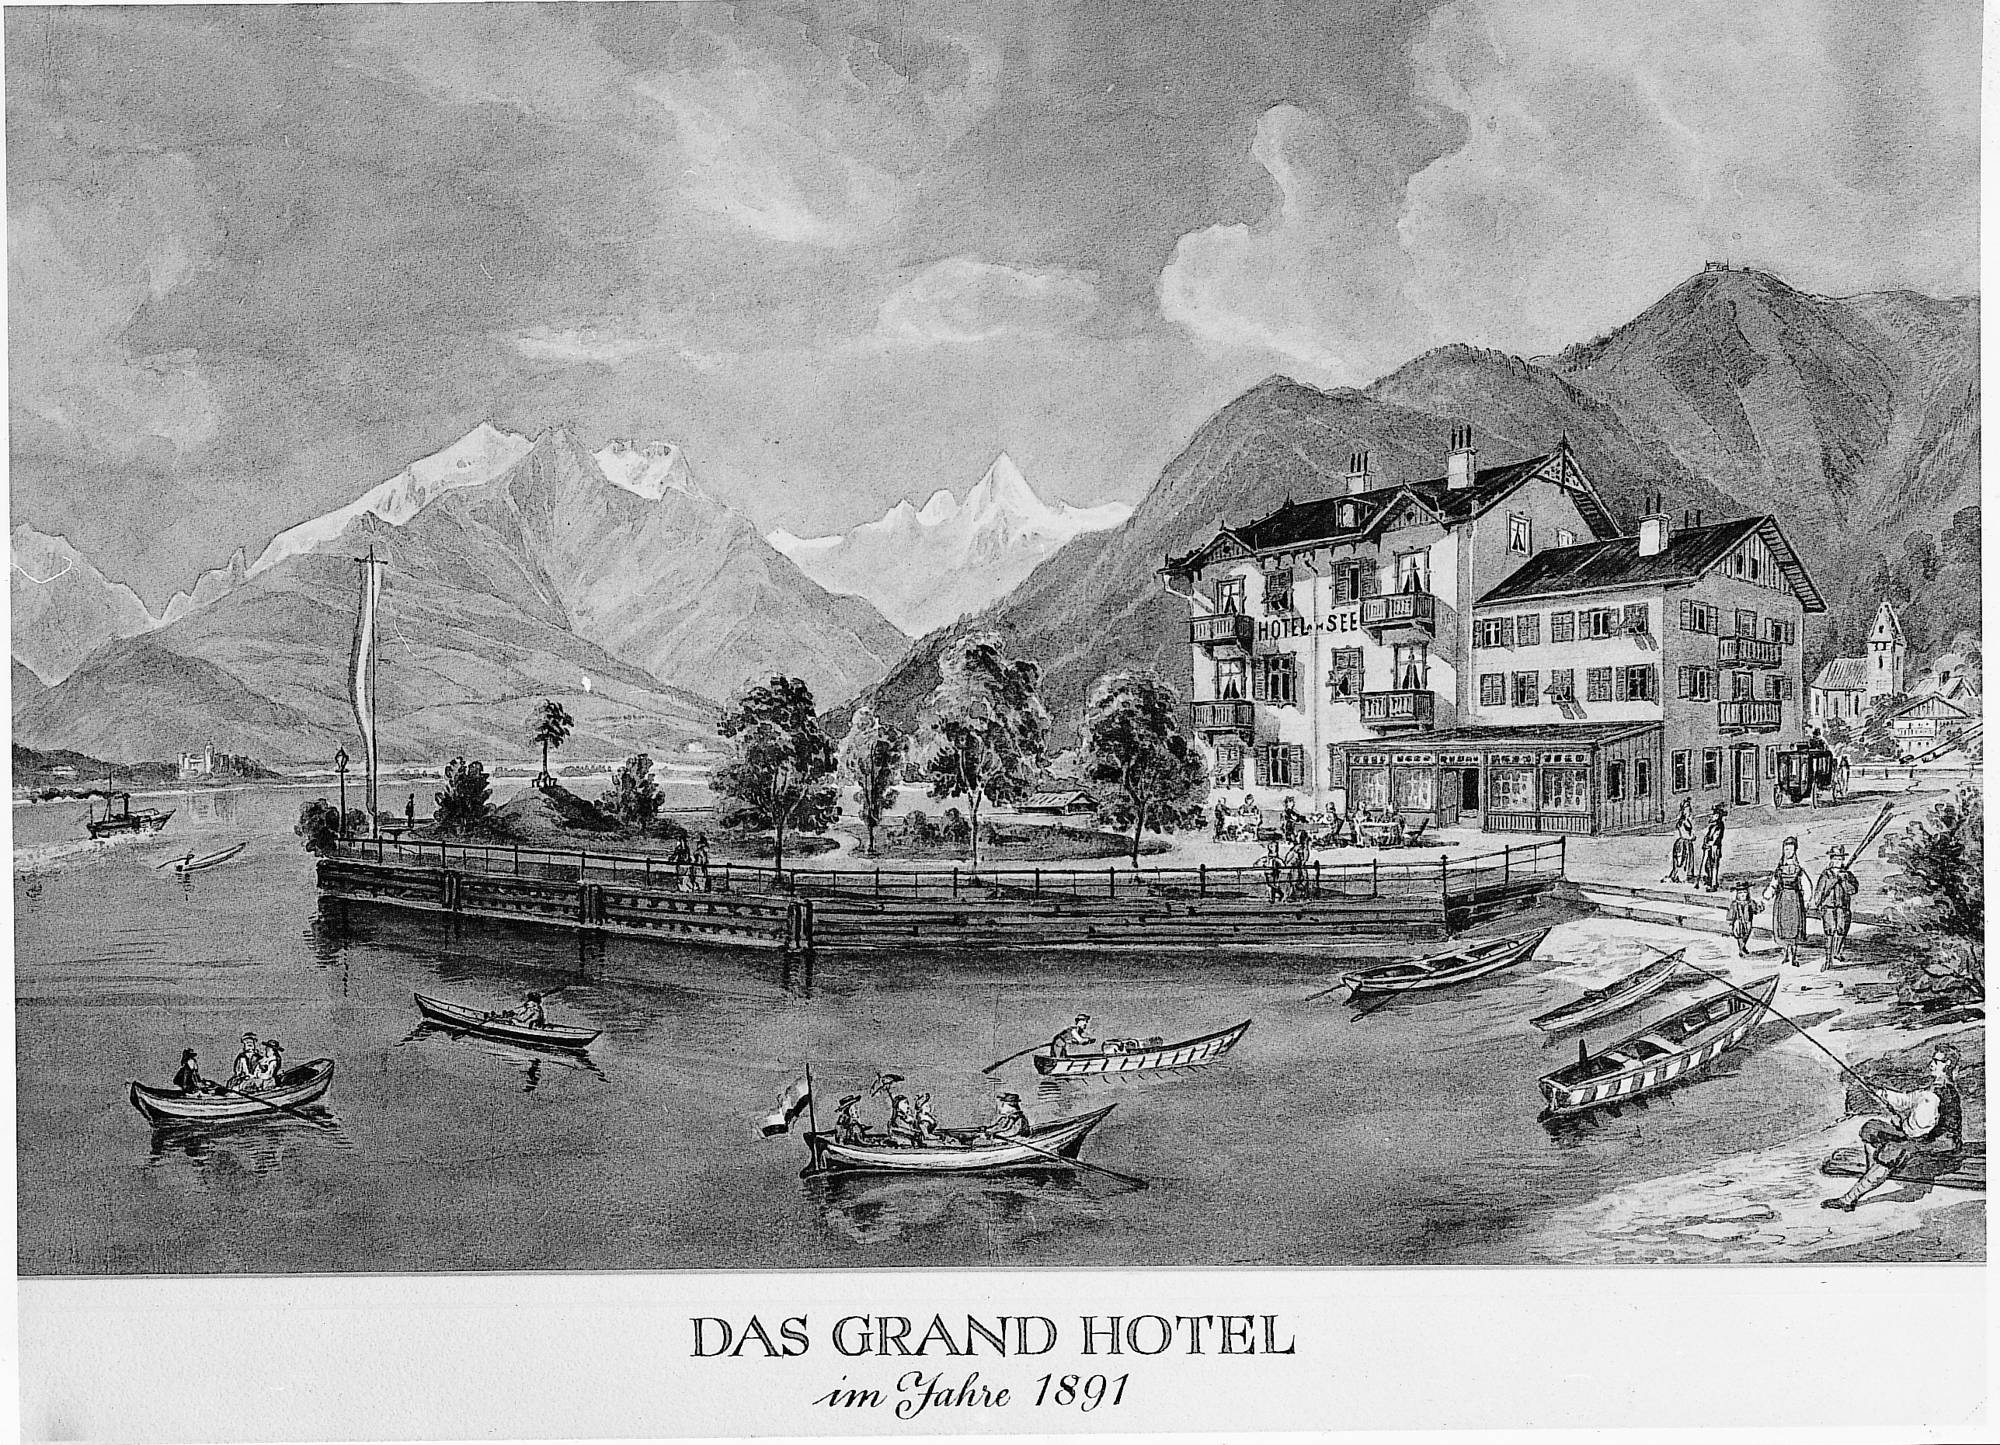 The Grand Hotel in 1891